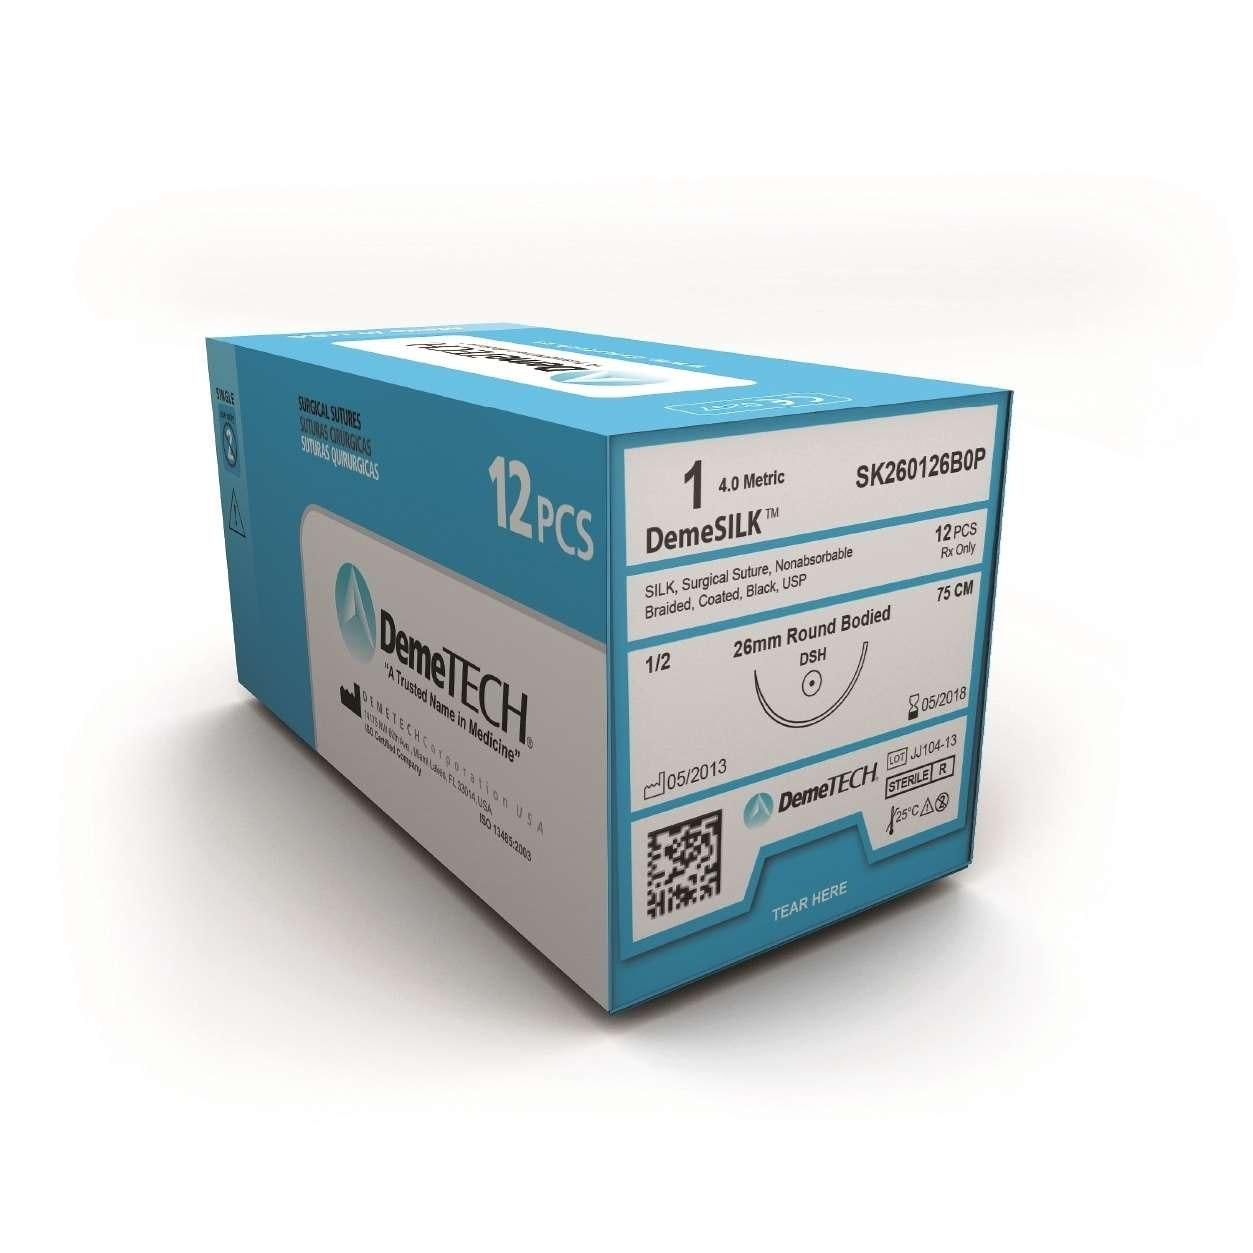 DemeTECH Silk Sutures 12/bx - Dental Supplies